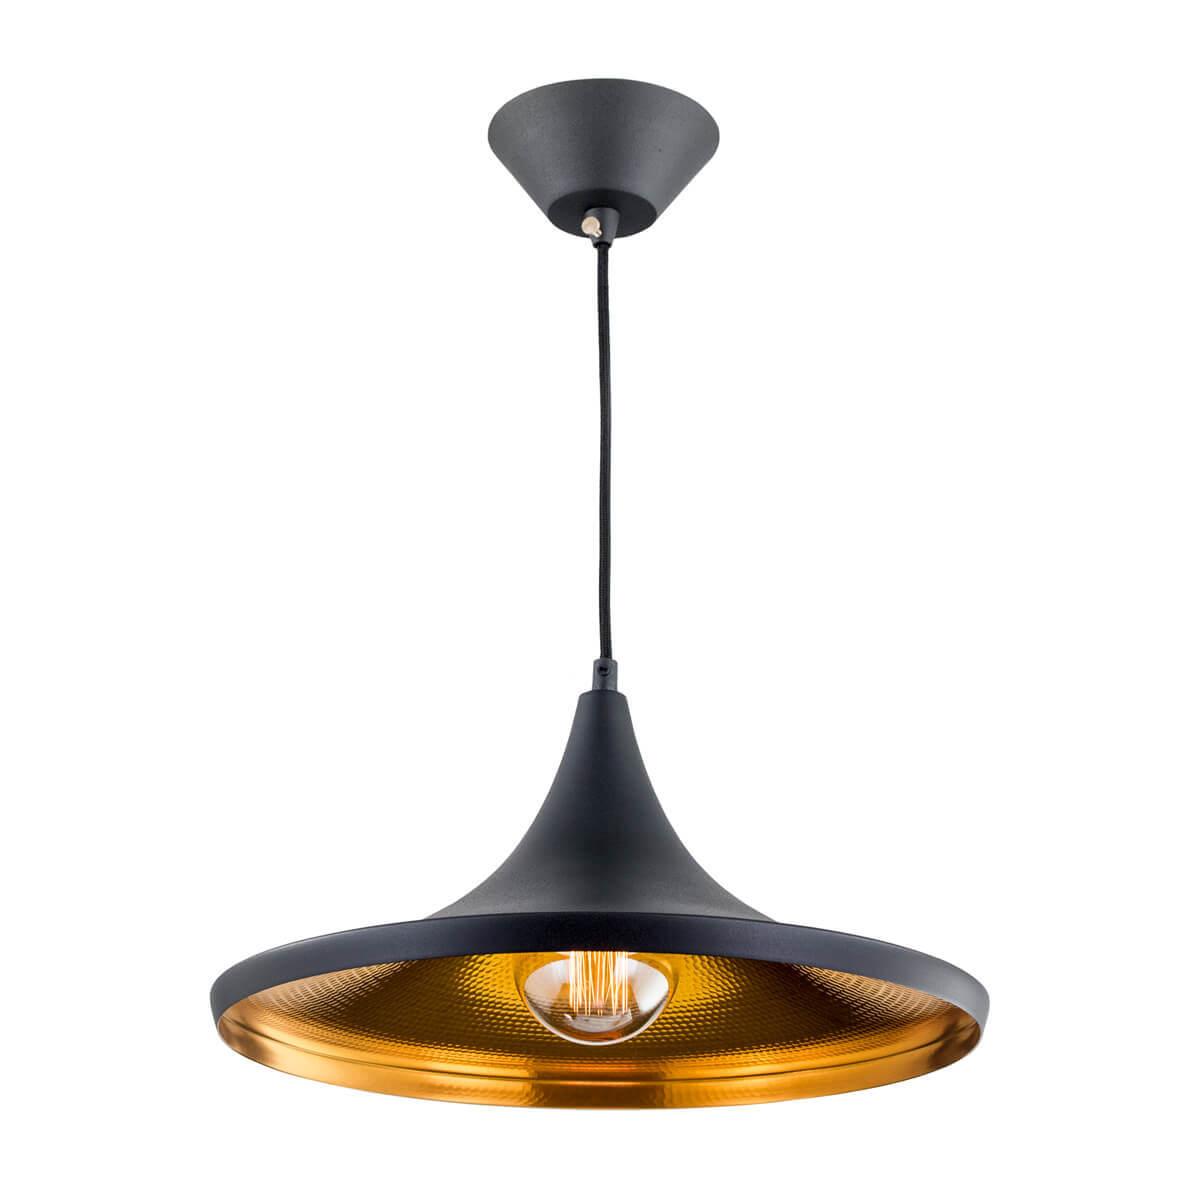 цена на Светильник Citilux CL450210 Эдисон